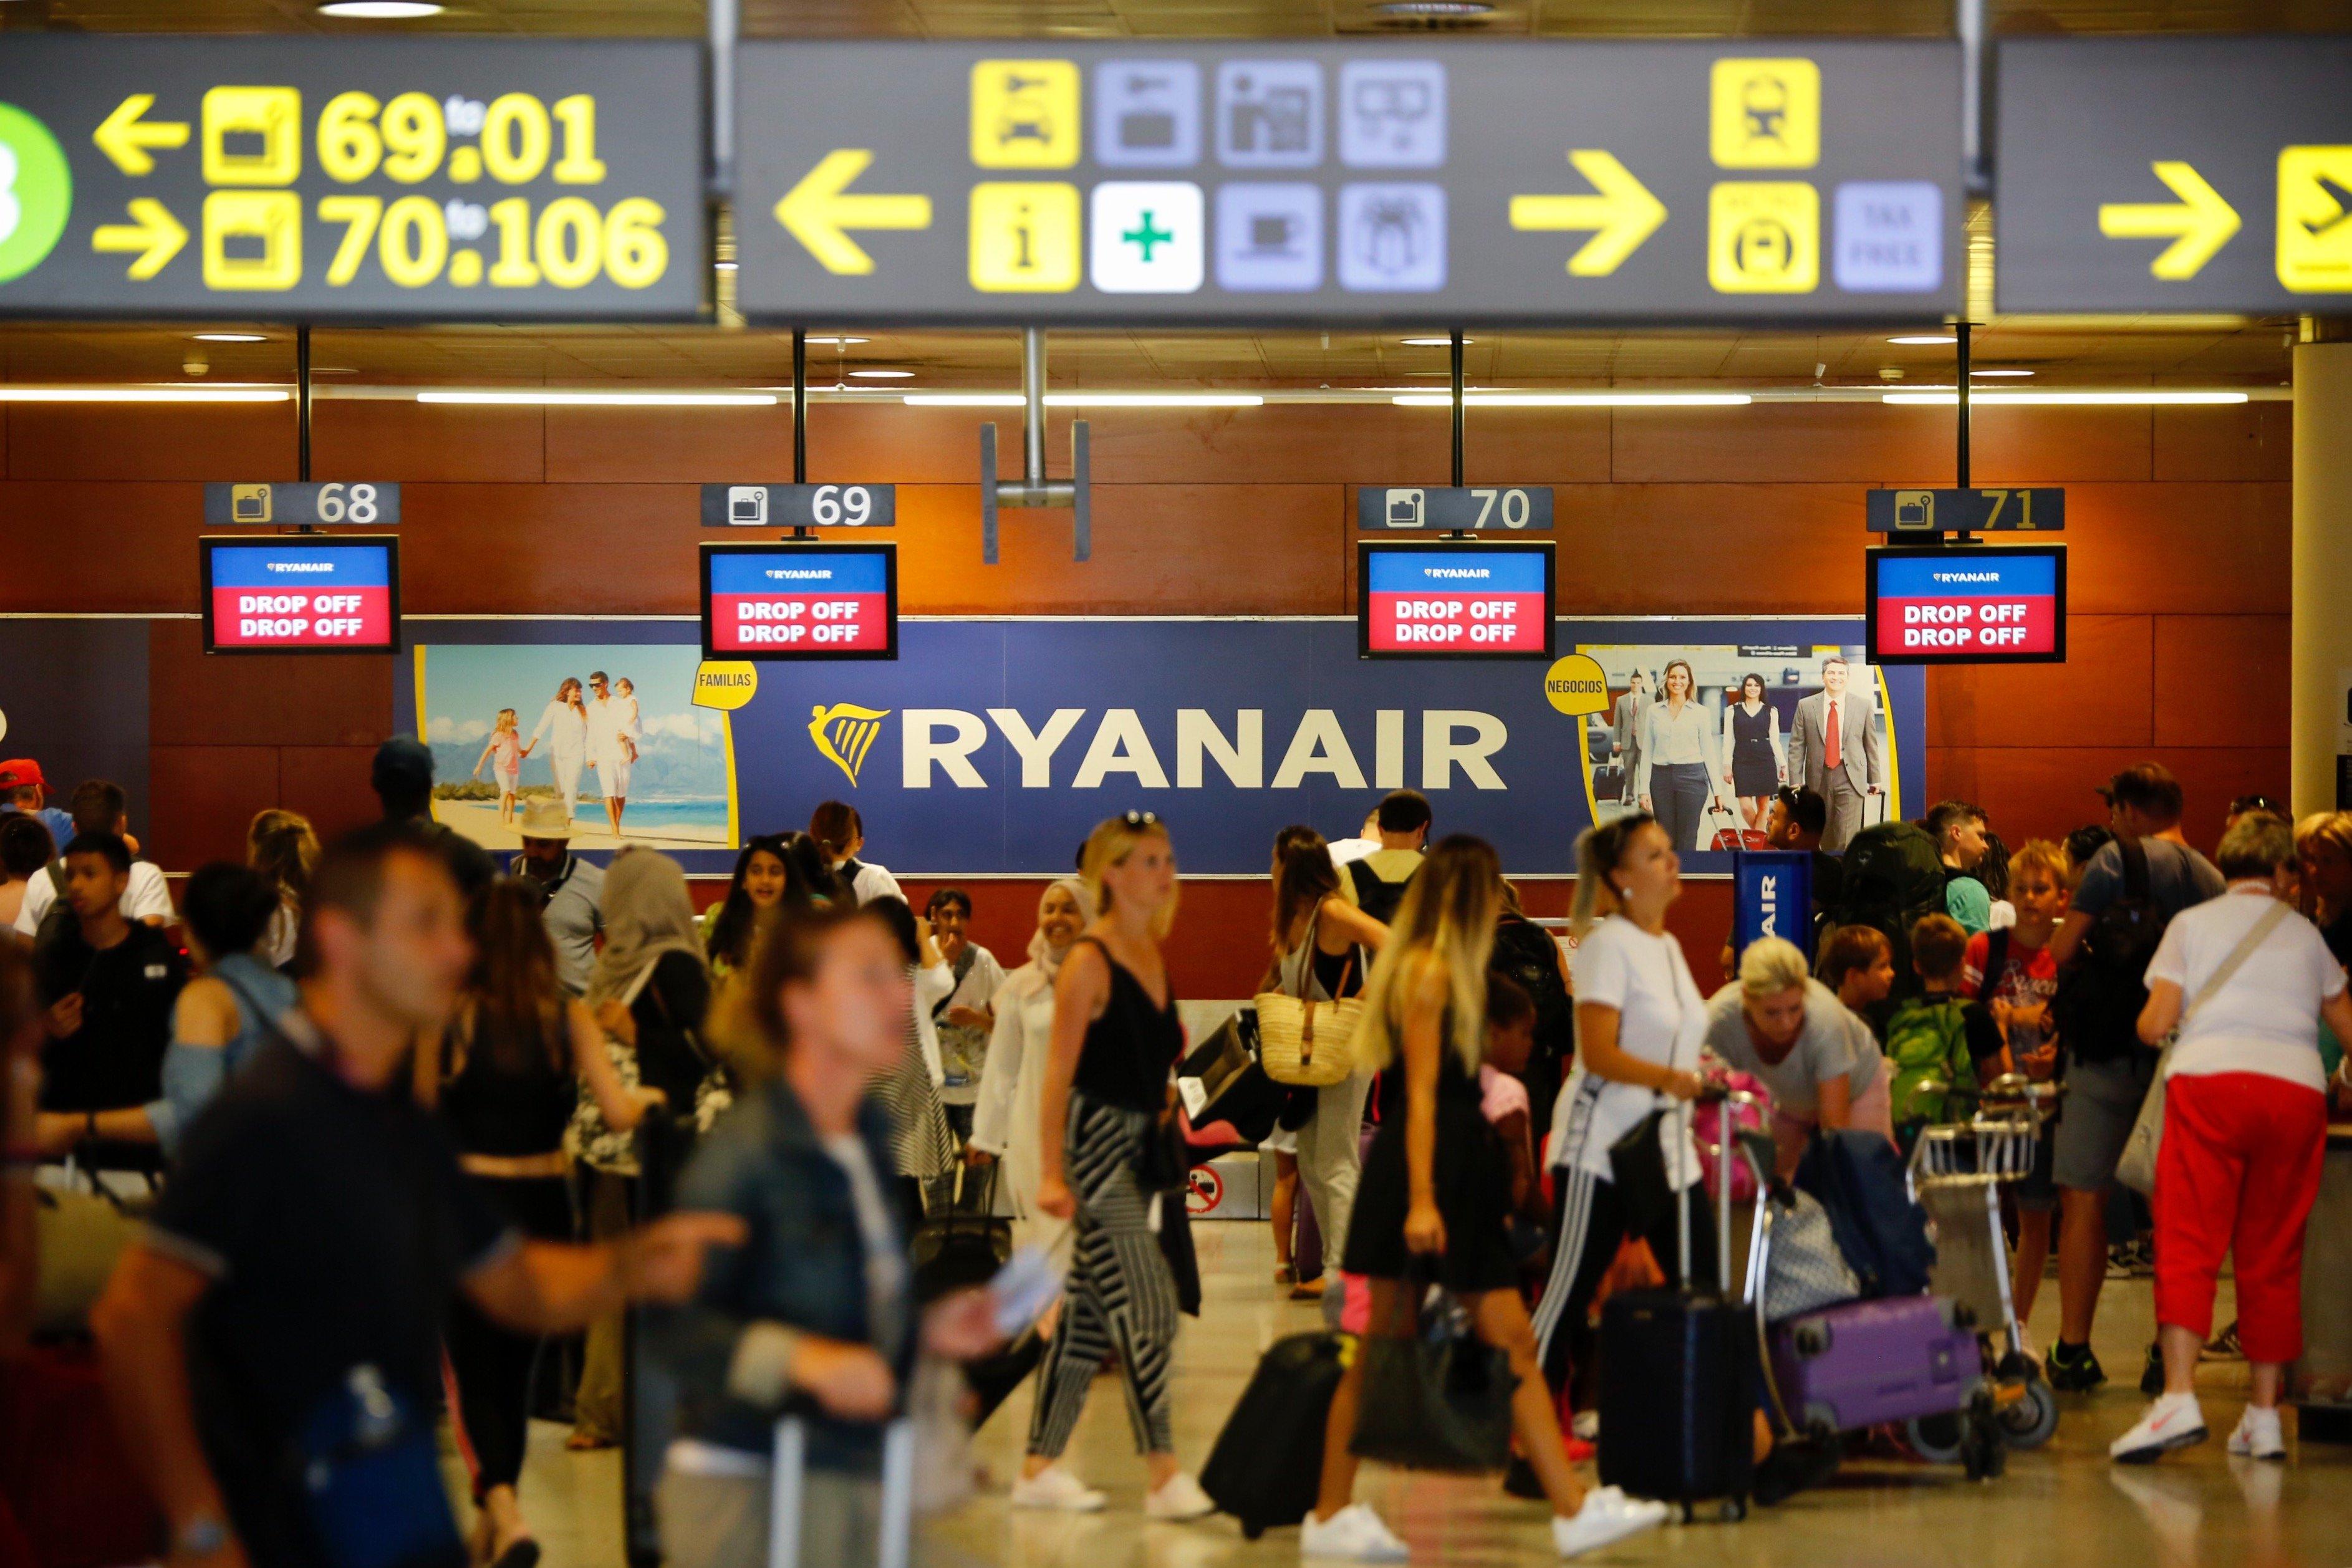 Vaga Ryanair aeroport del Prat - Sergi Alcàzar